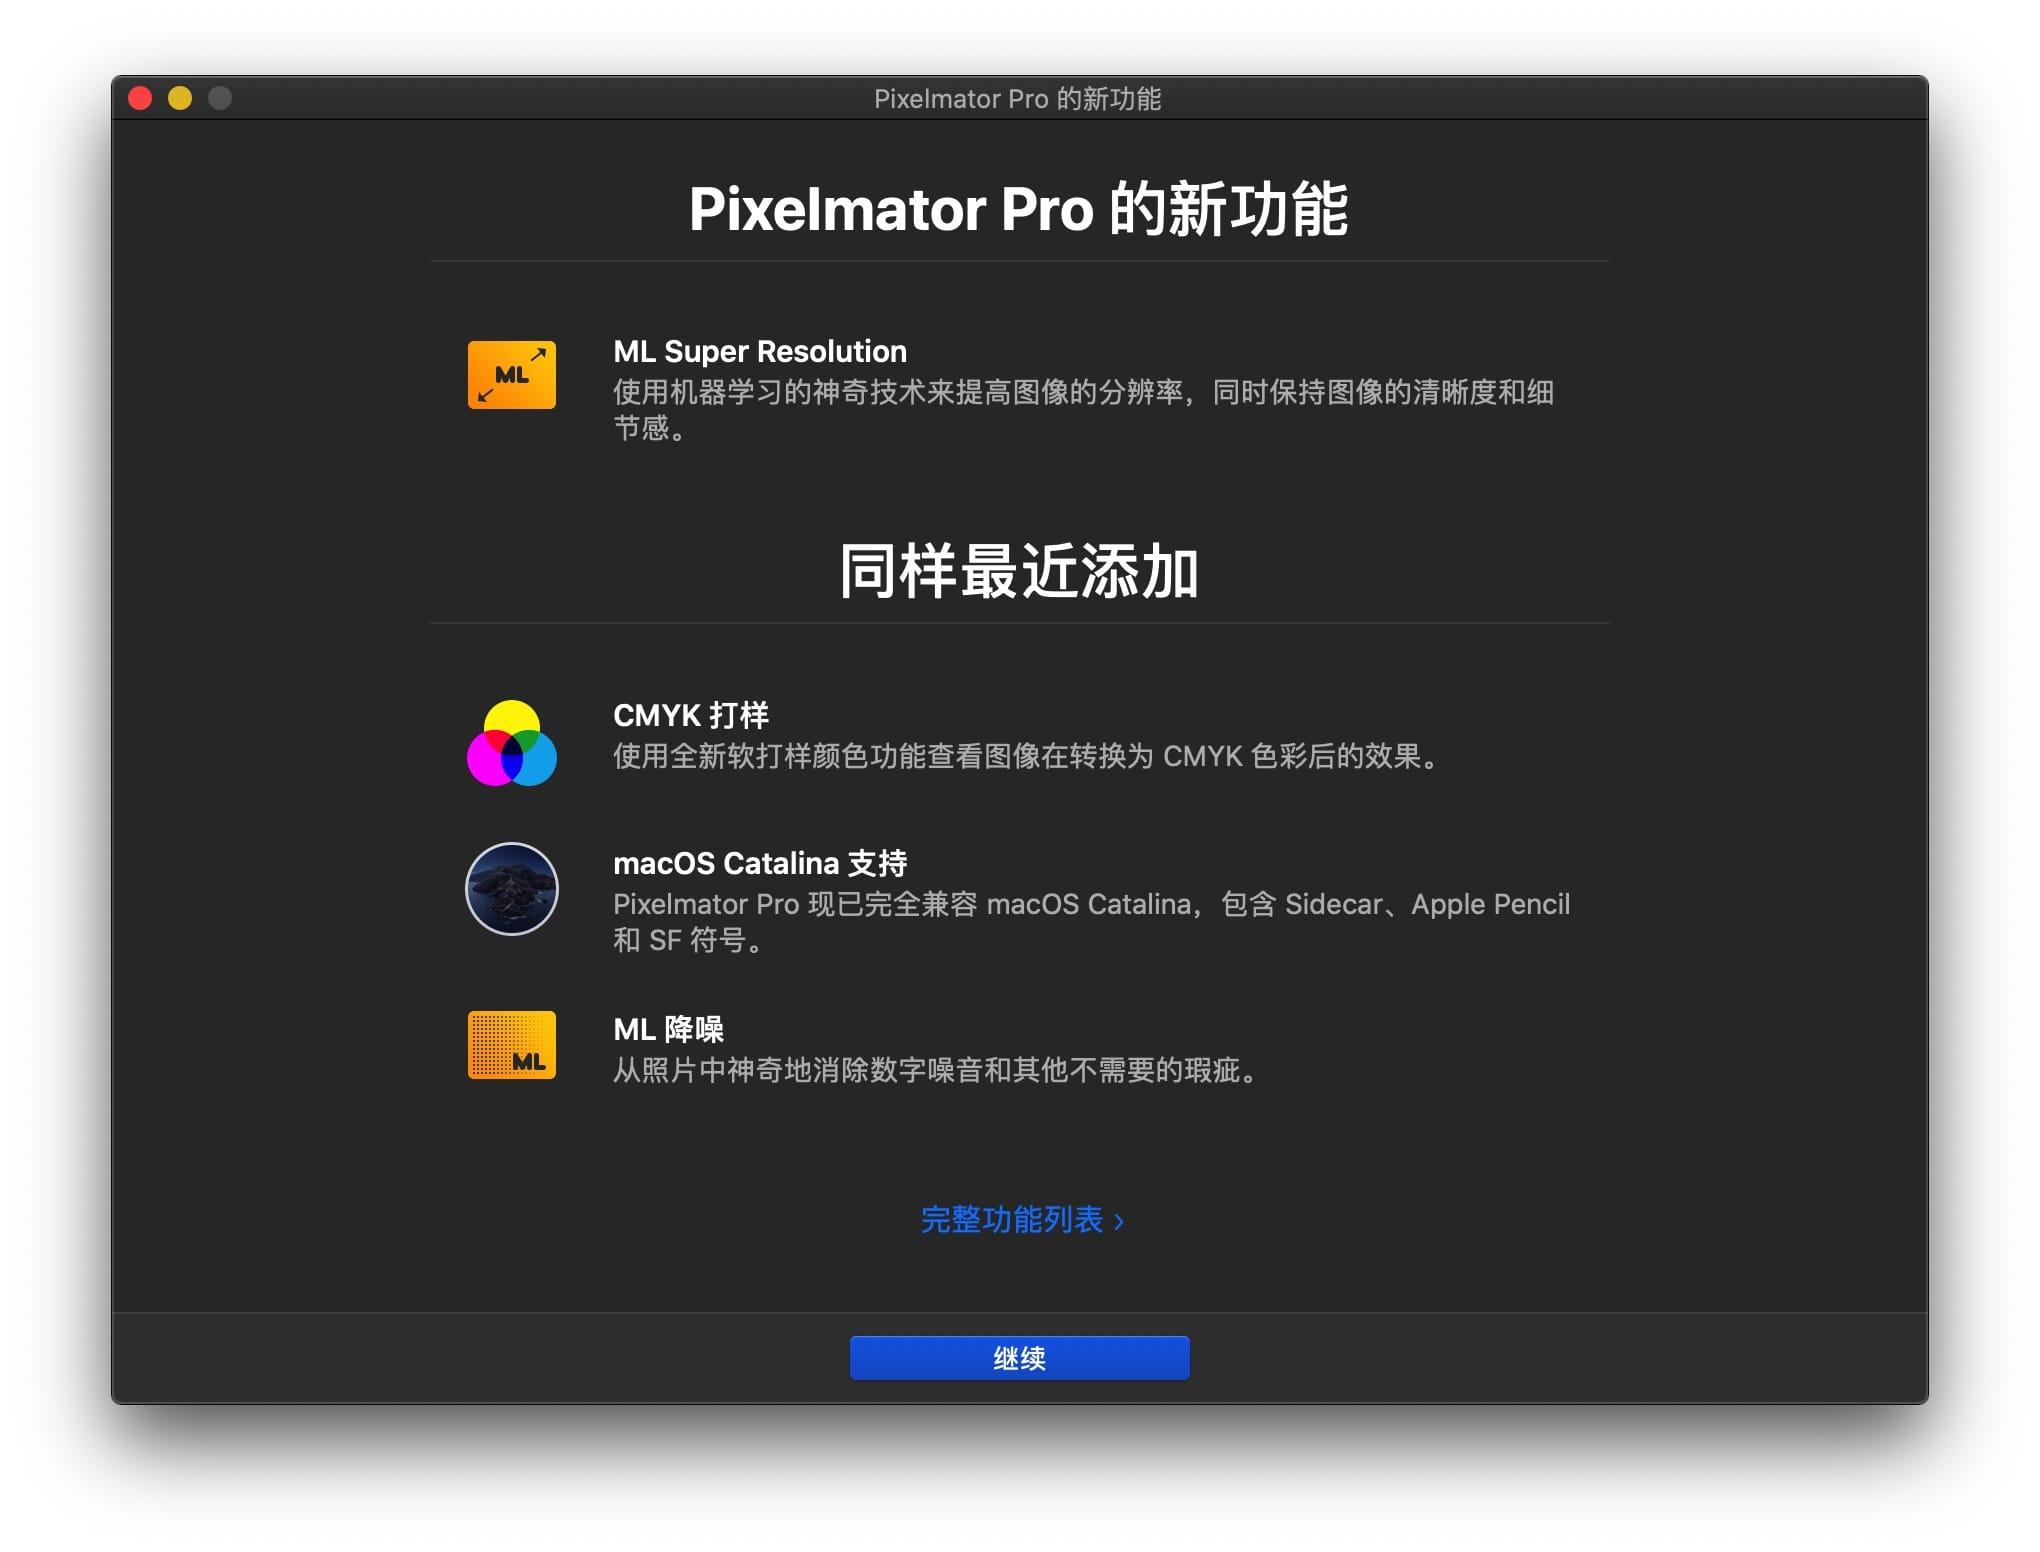 Pixelmator Pro 1.5.4 非常小巧的图像处理软件